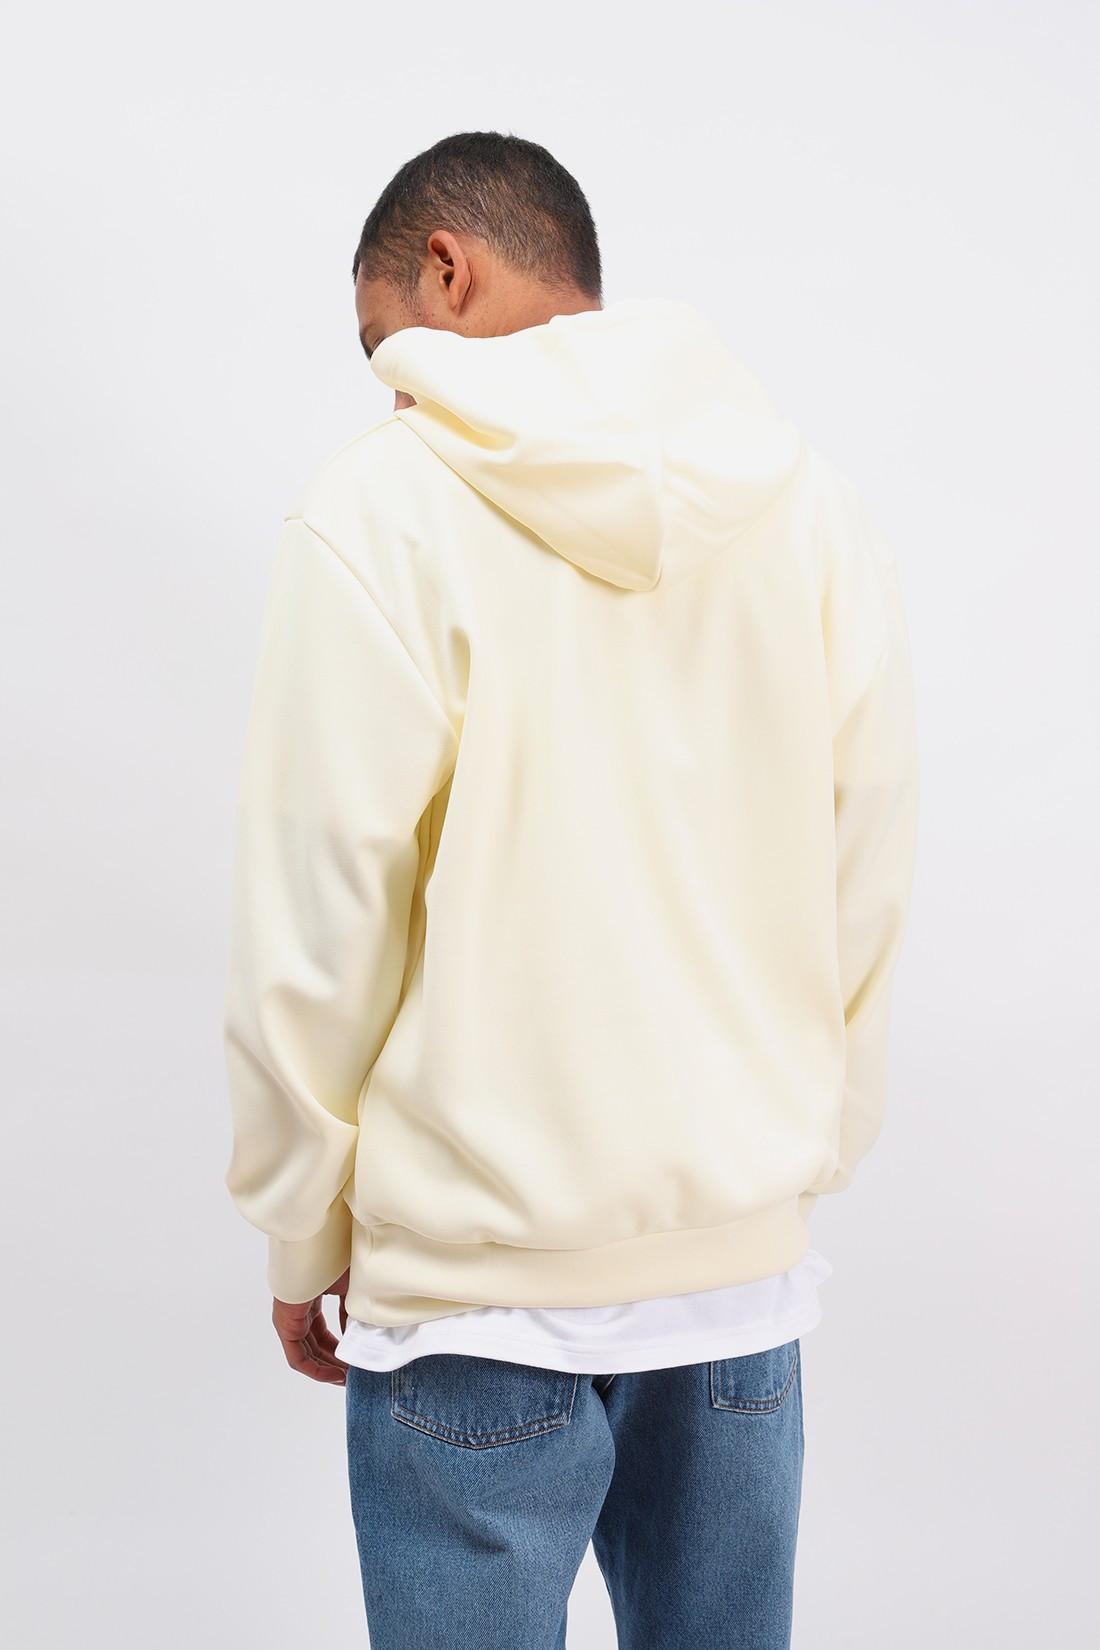 COMME DES GARÇONS PLAY / Play hooded sweatshirt Ivory